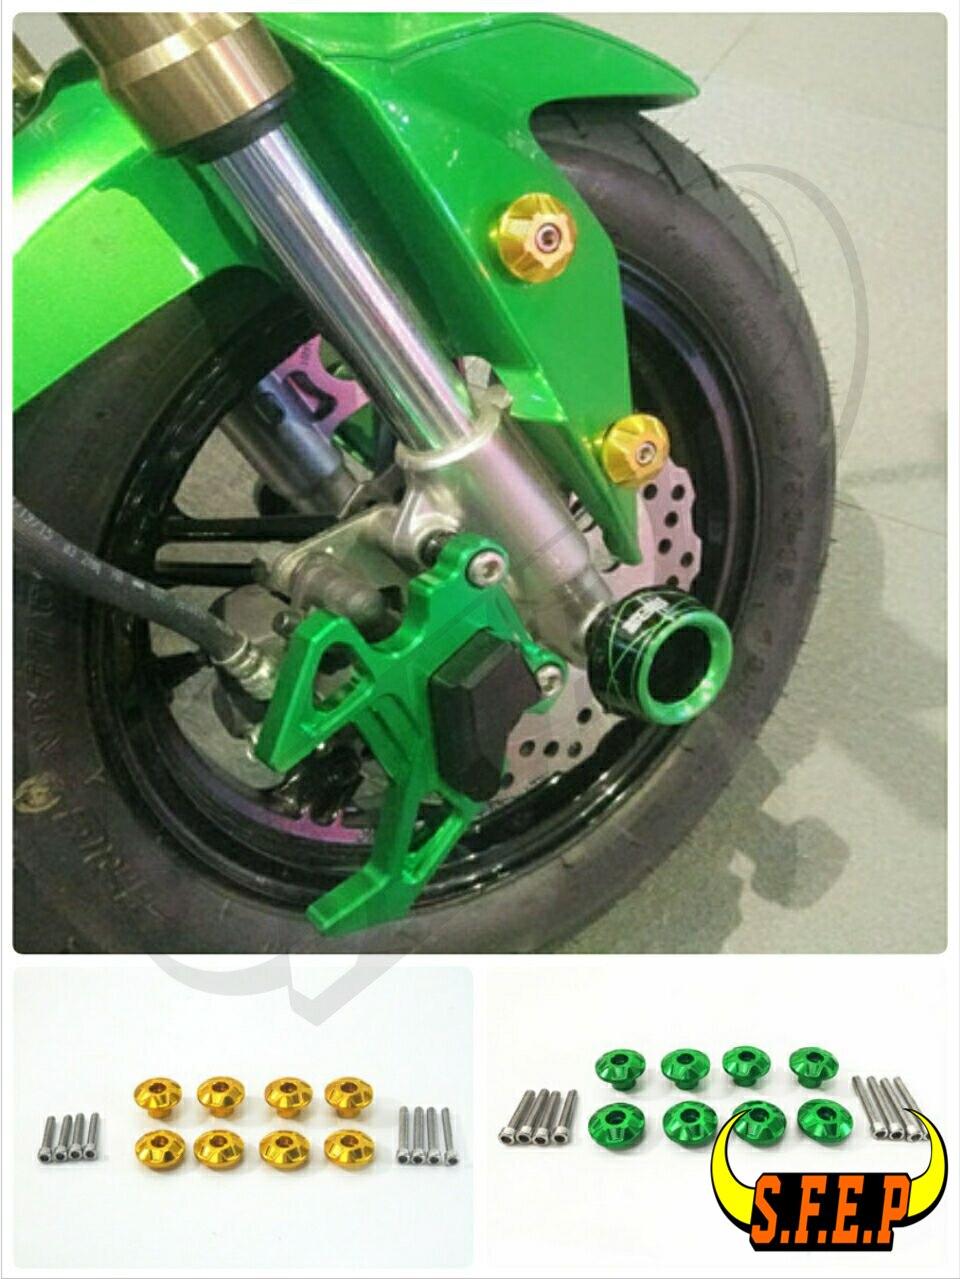 Motorcycle Universal CNC Frame Hole Cover For Honda GROM MSX125 MSX125SF CBR250R CBR300R CBR500R CBR650F CBR600RR CBR1000RR